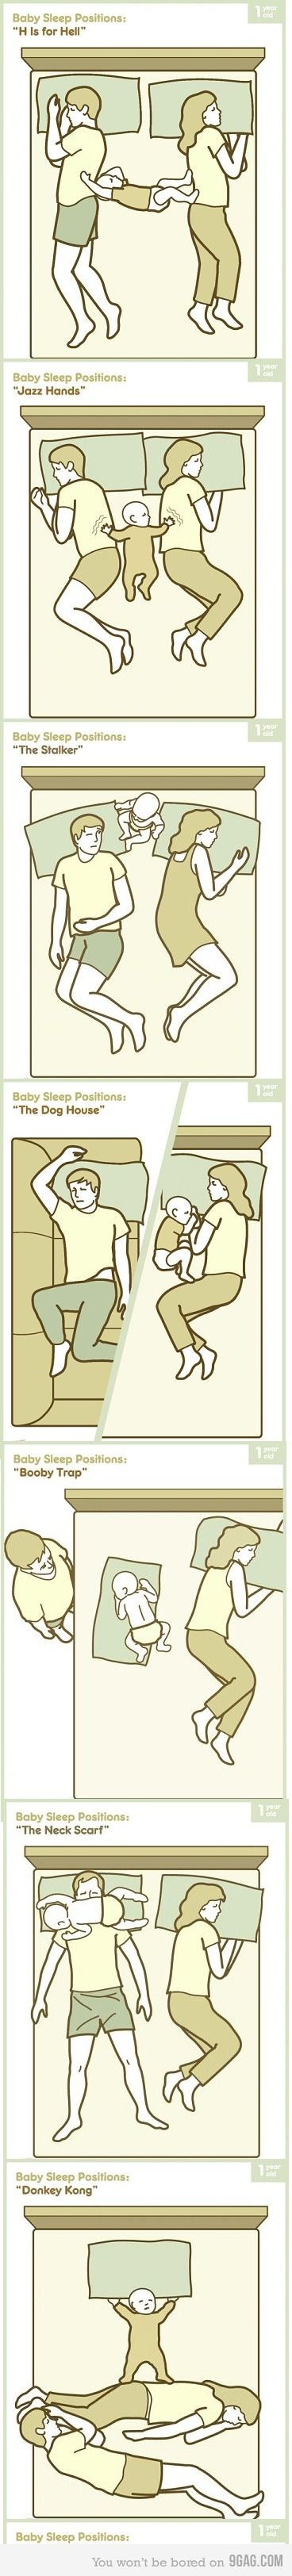 Sleeping with kids.